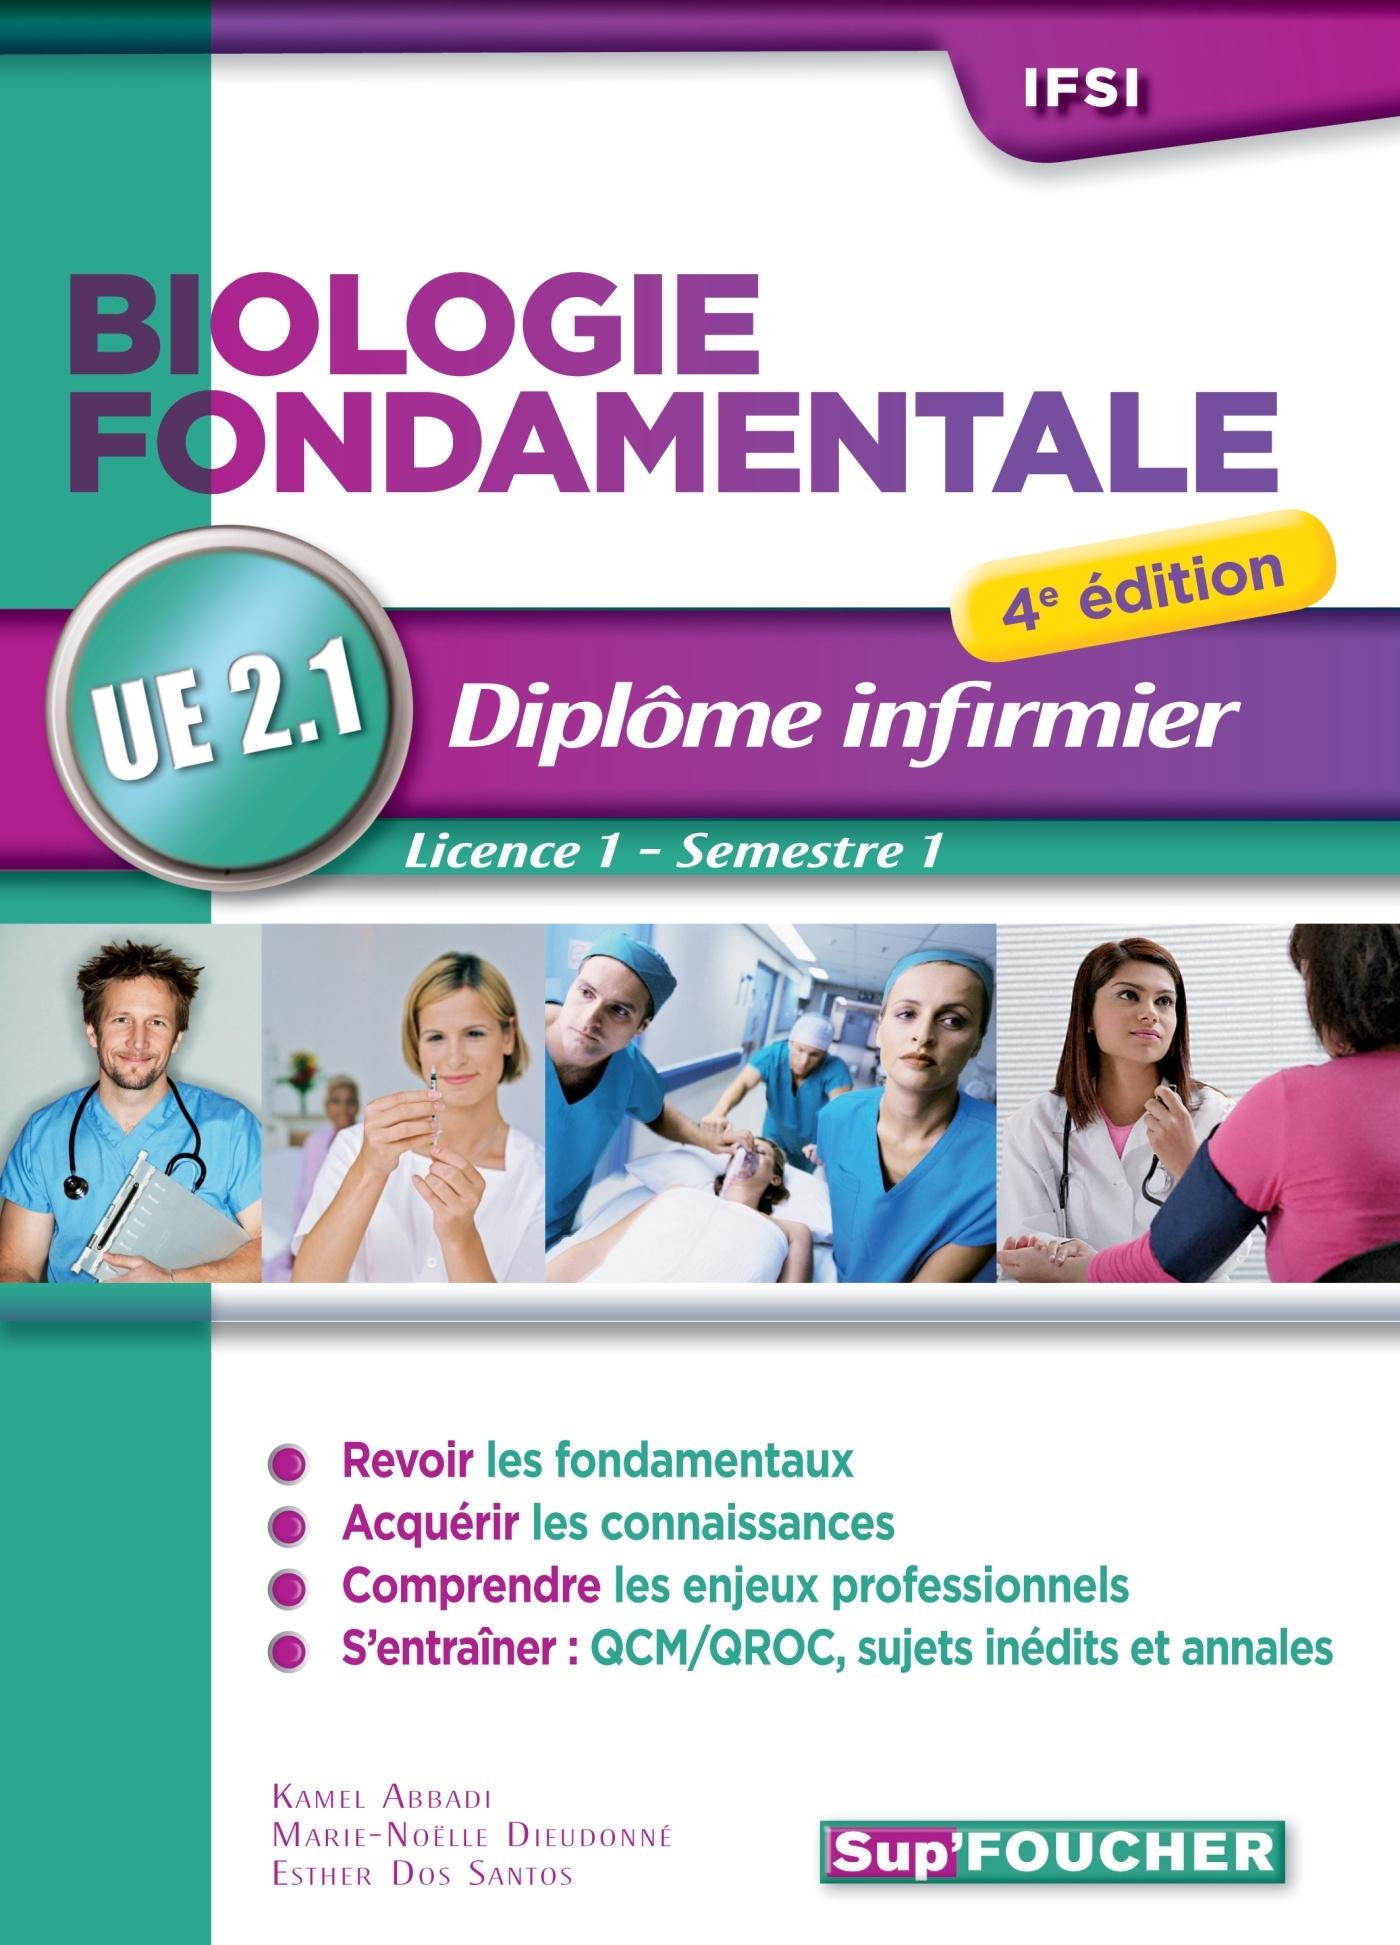 BIOLOGIE FONDAMENTALE - UE 2.1 - SEMESTRE 1 - DIPLOME D'ETAT INFIRMIER - IFSI - 4E EDITION